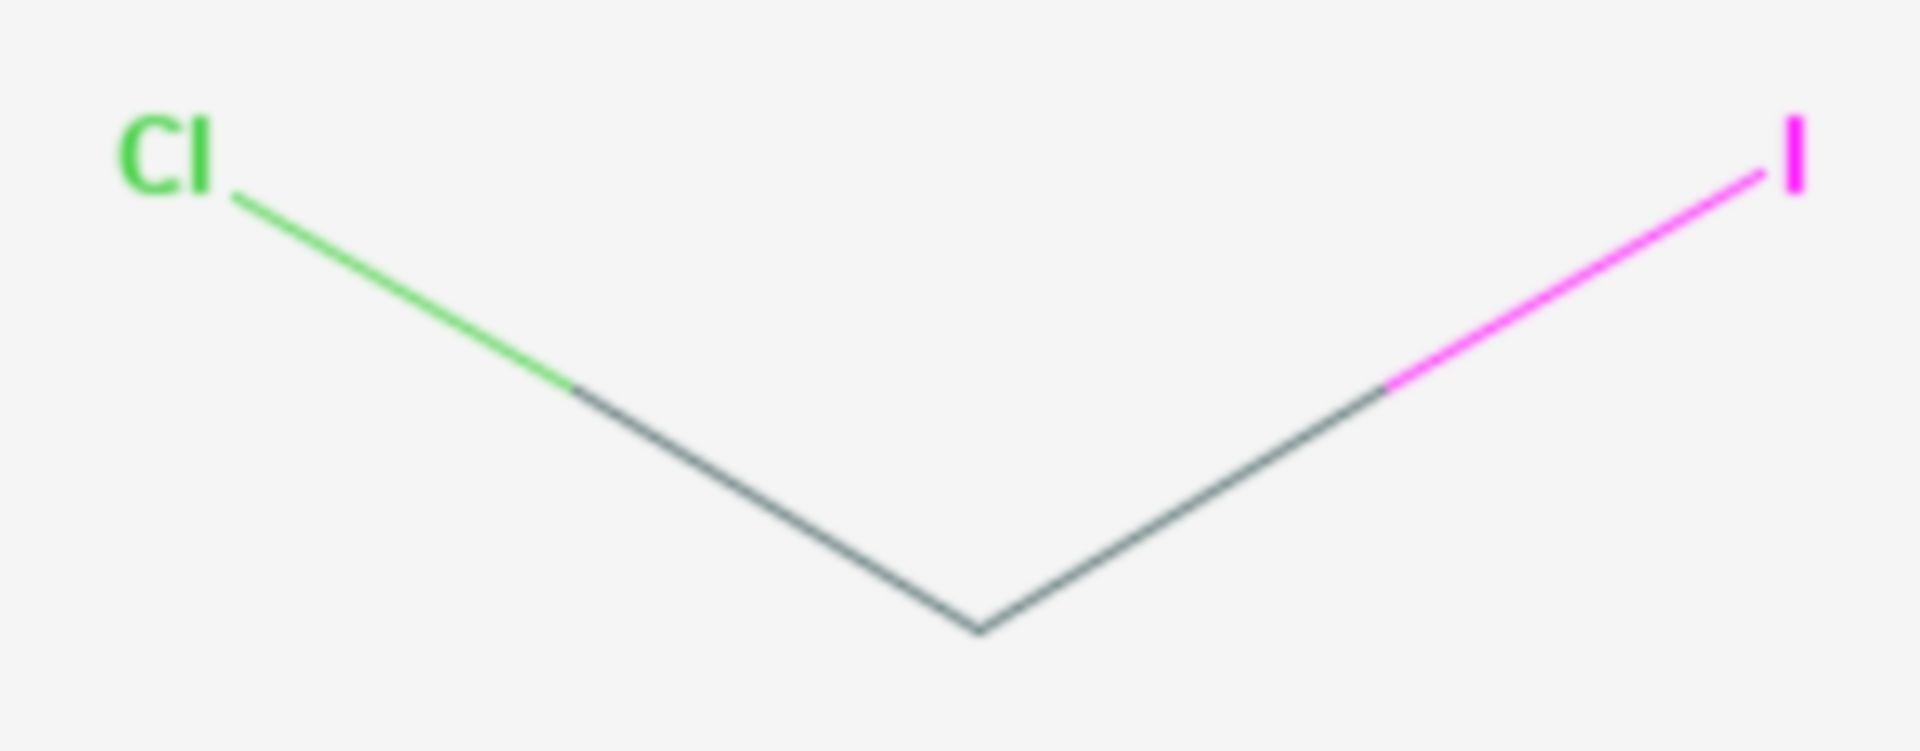 Chloriodmethan (Strukturformel)